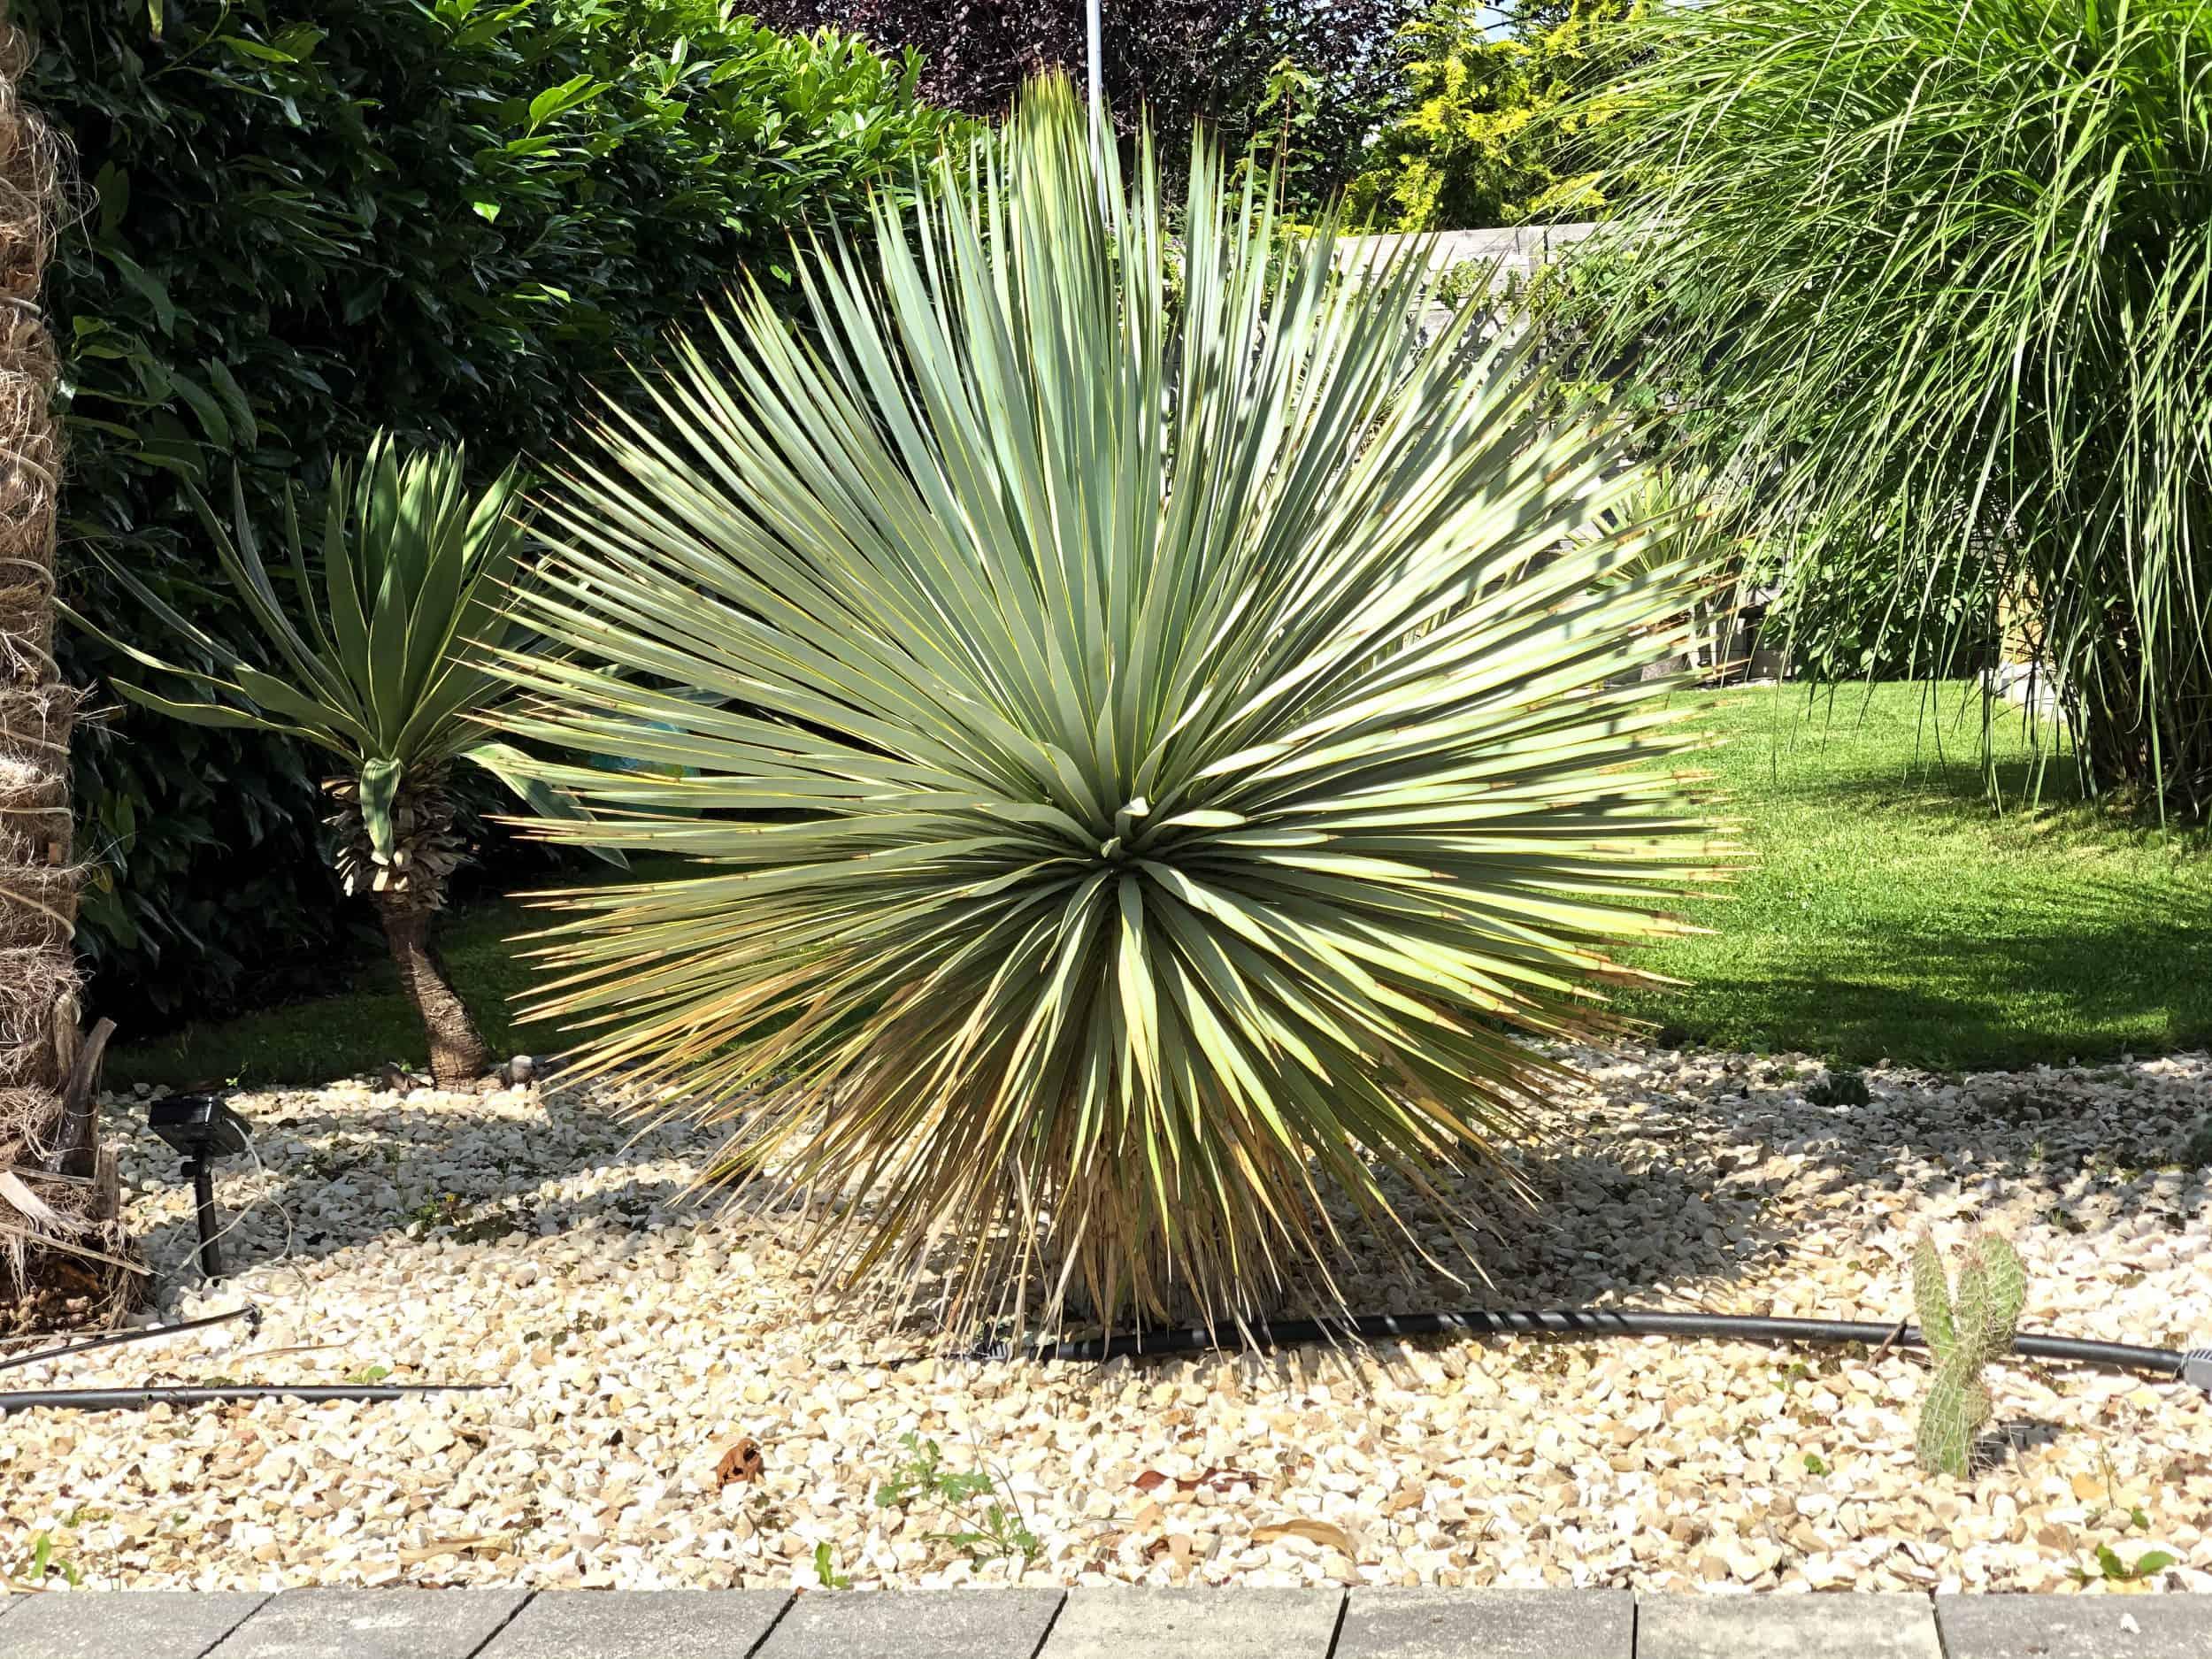 20-07-Yucca rostrata 02